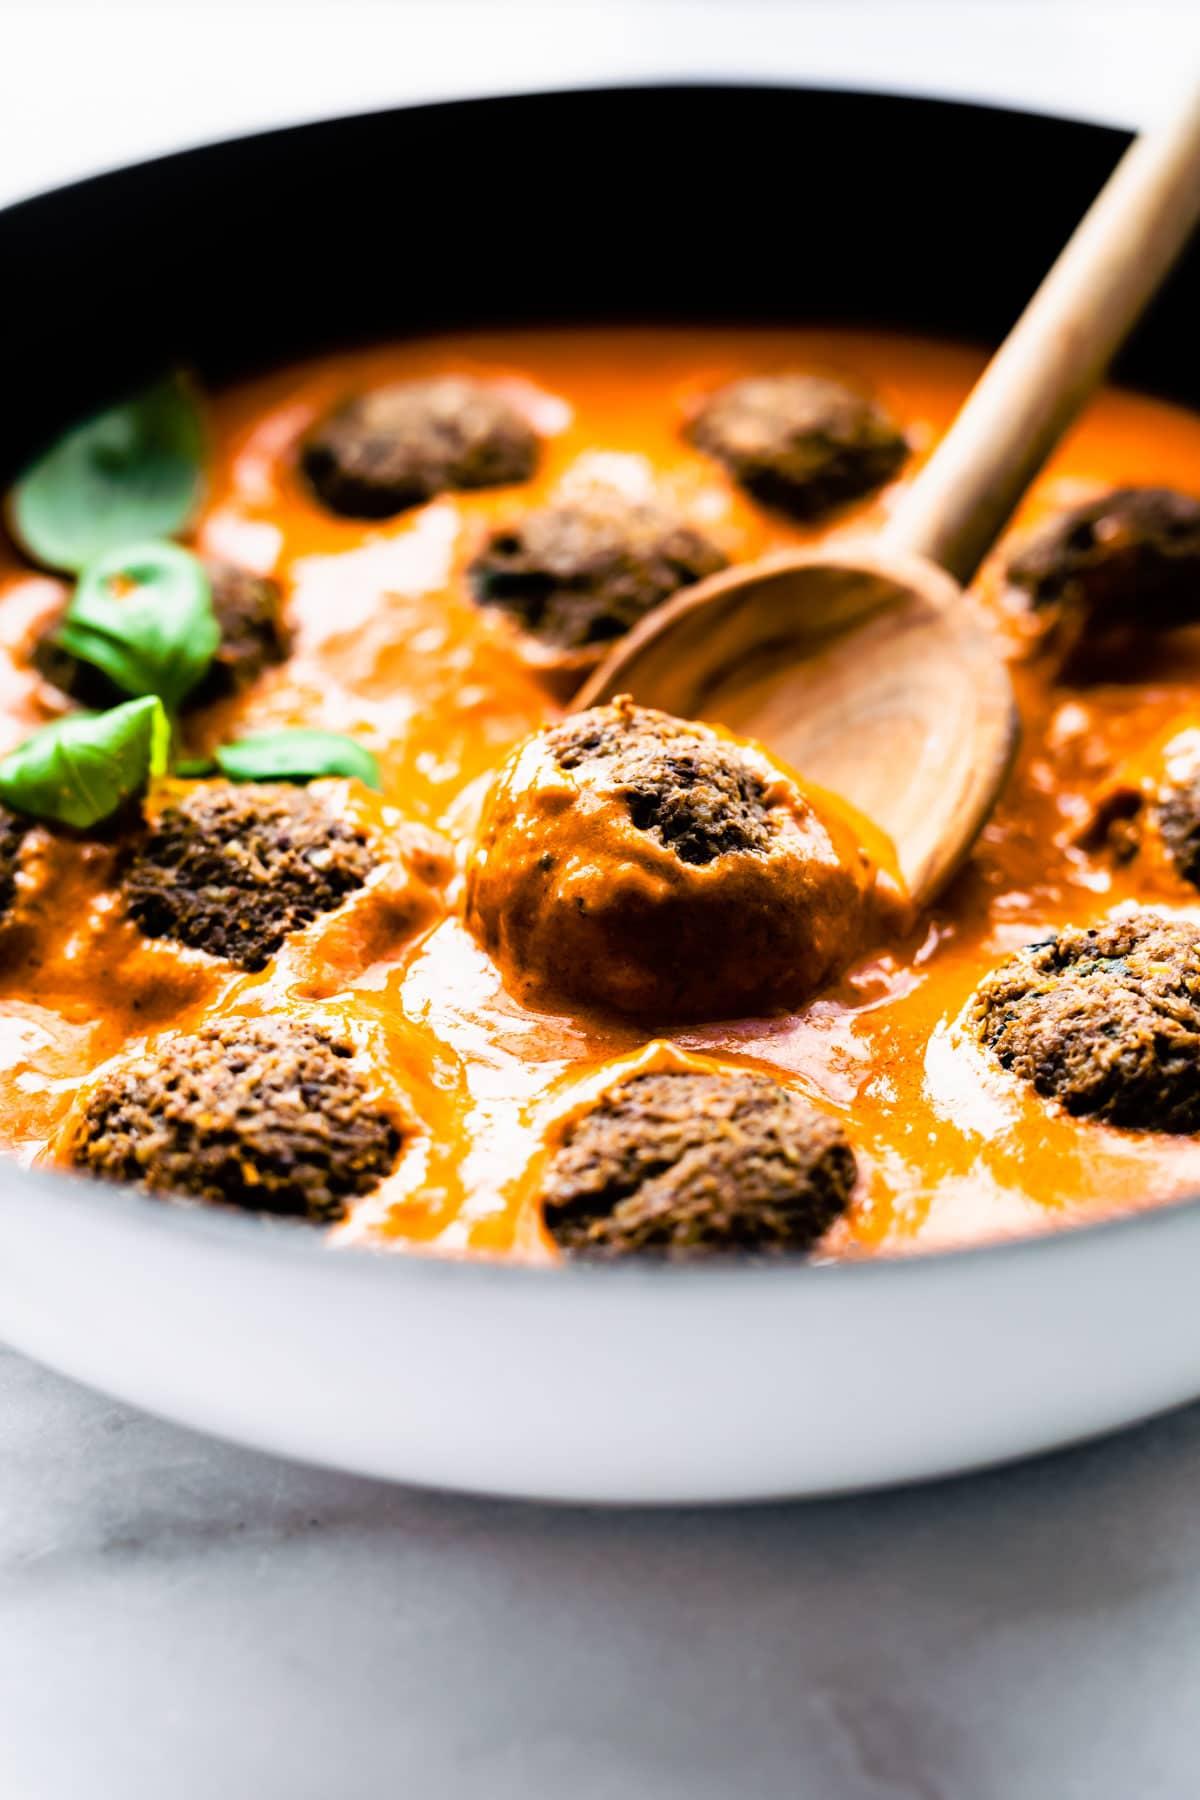 meatballs in pan and sauce with spoon. vegan meatballs